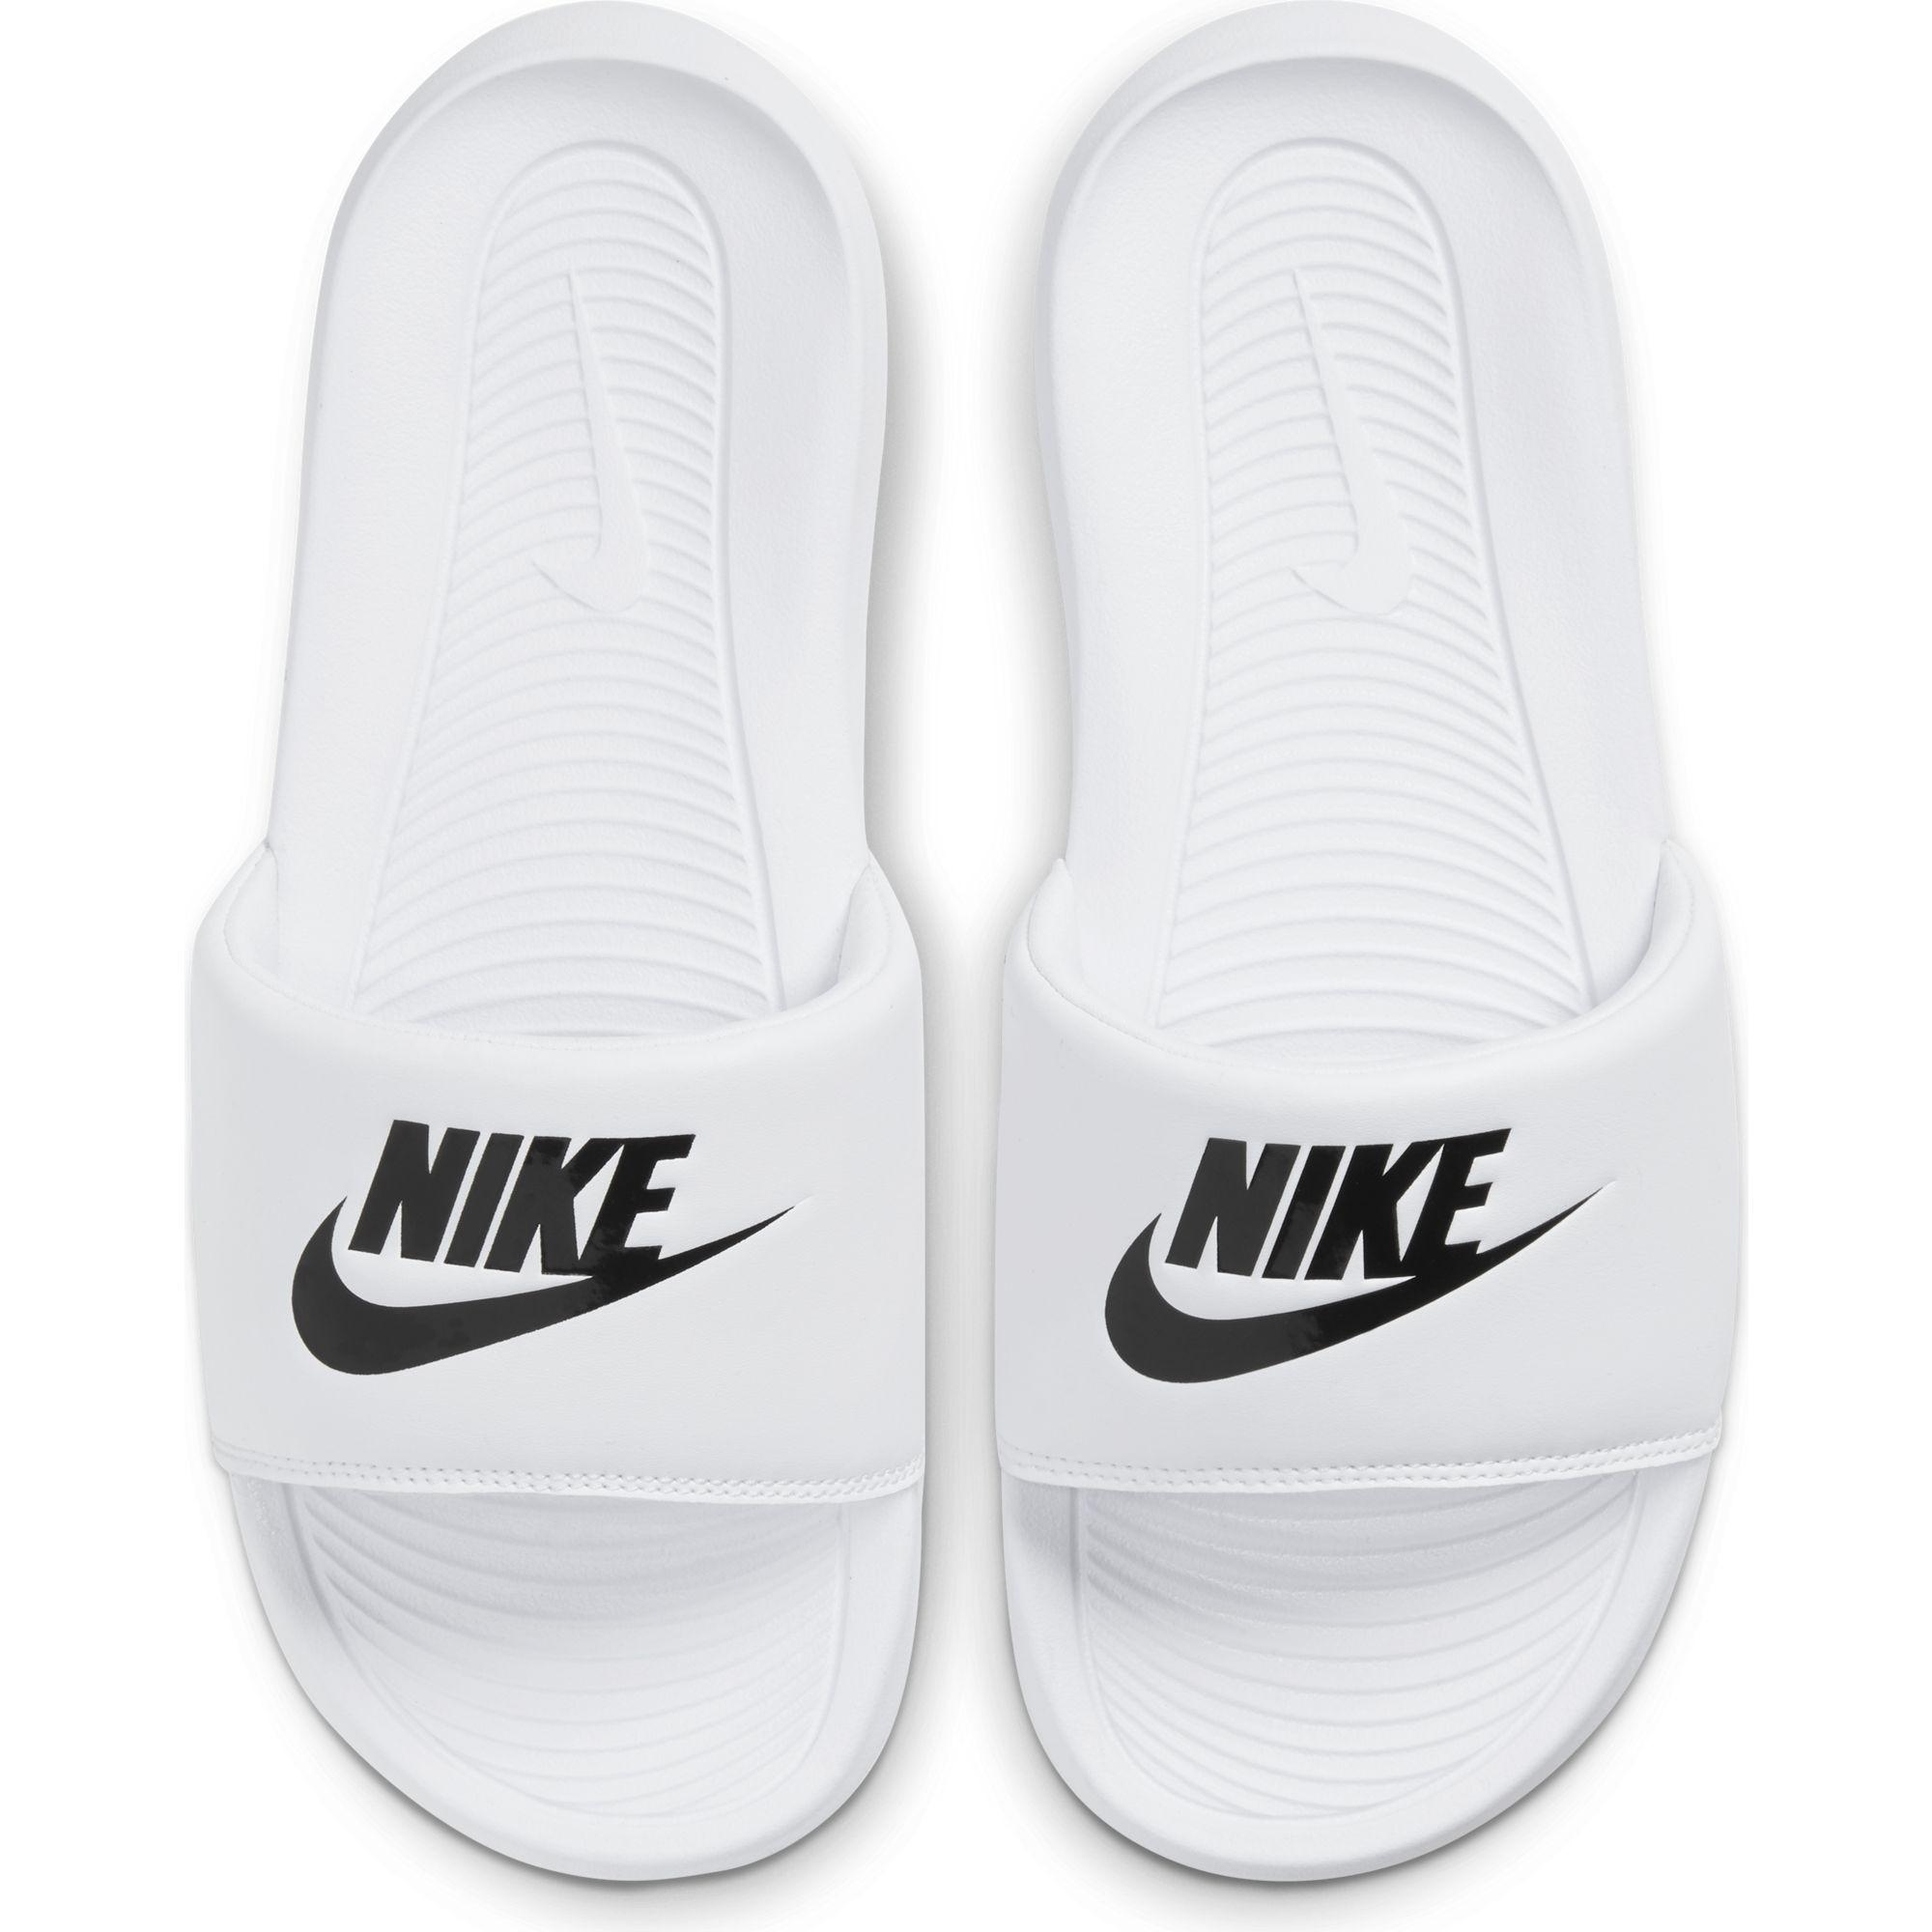 Nike Badeschuhe Victori One Damen, weiß, 40.5 Damen CN9677-100